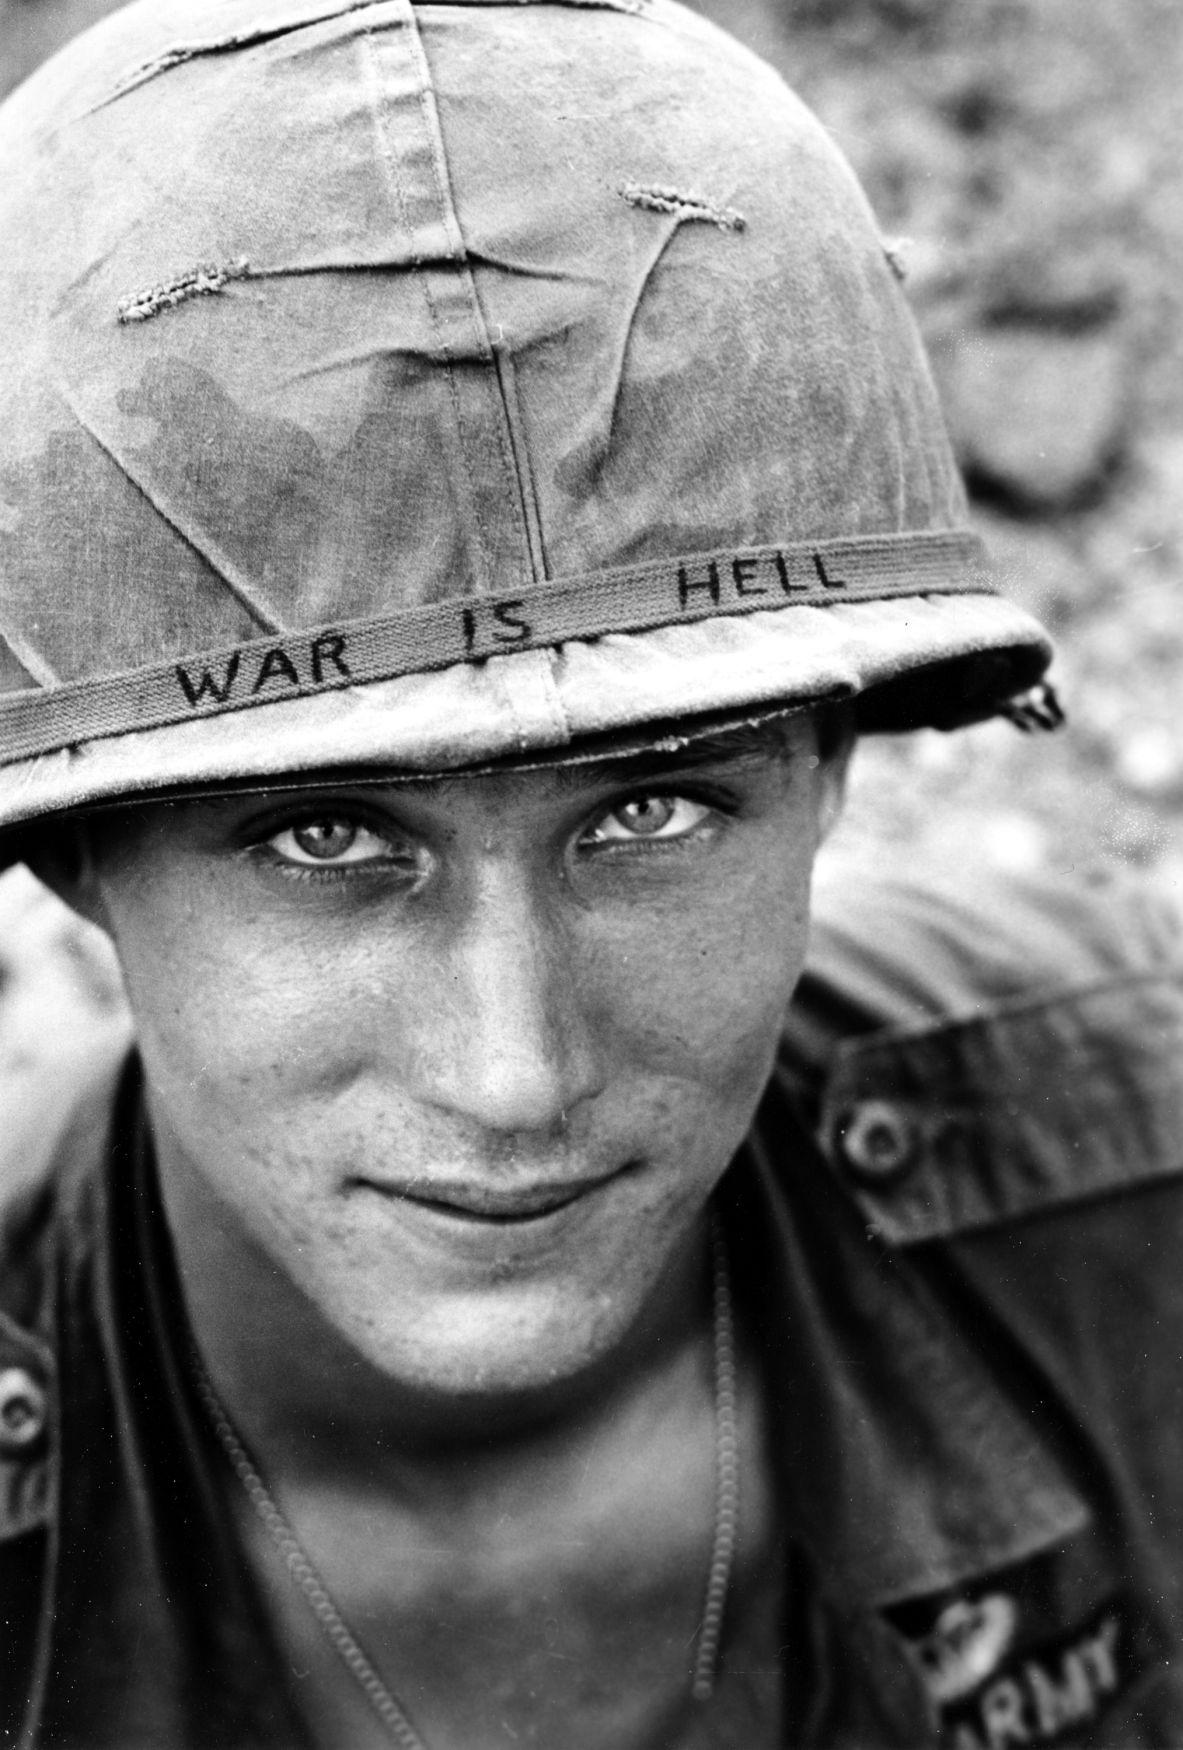 Photos Iconic Images From The Vietnam War Era World Billingsgazette Com